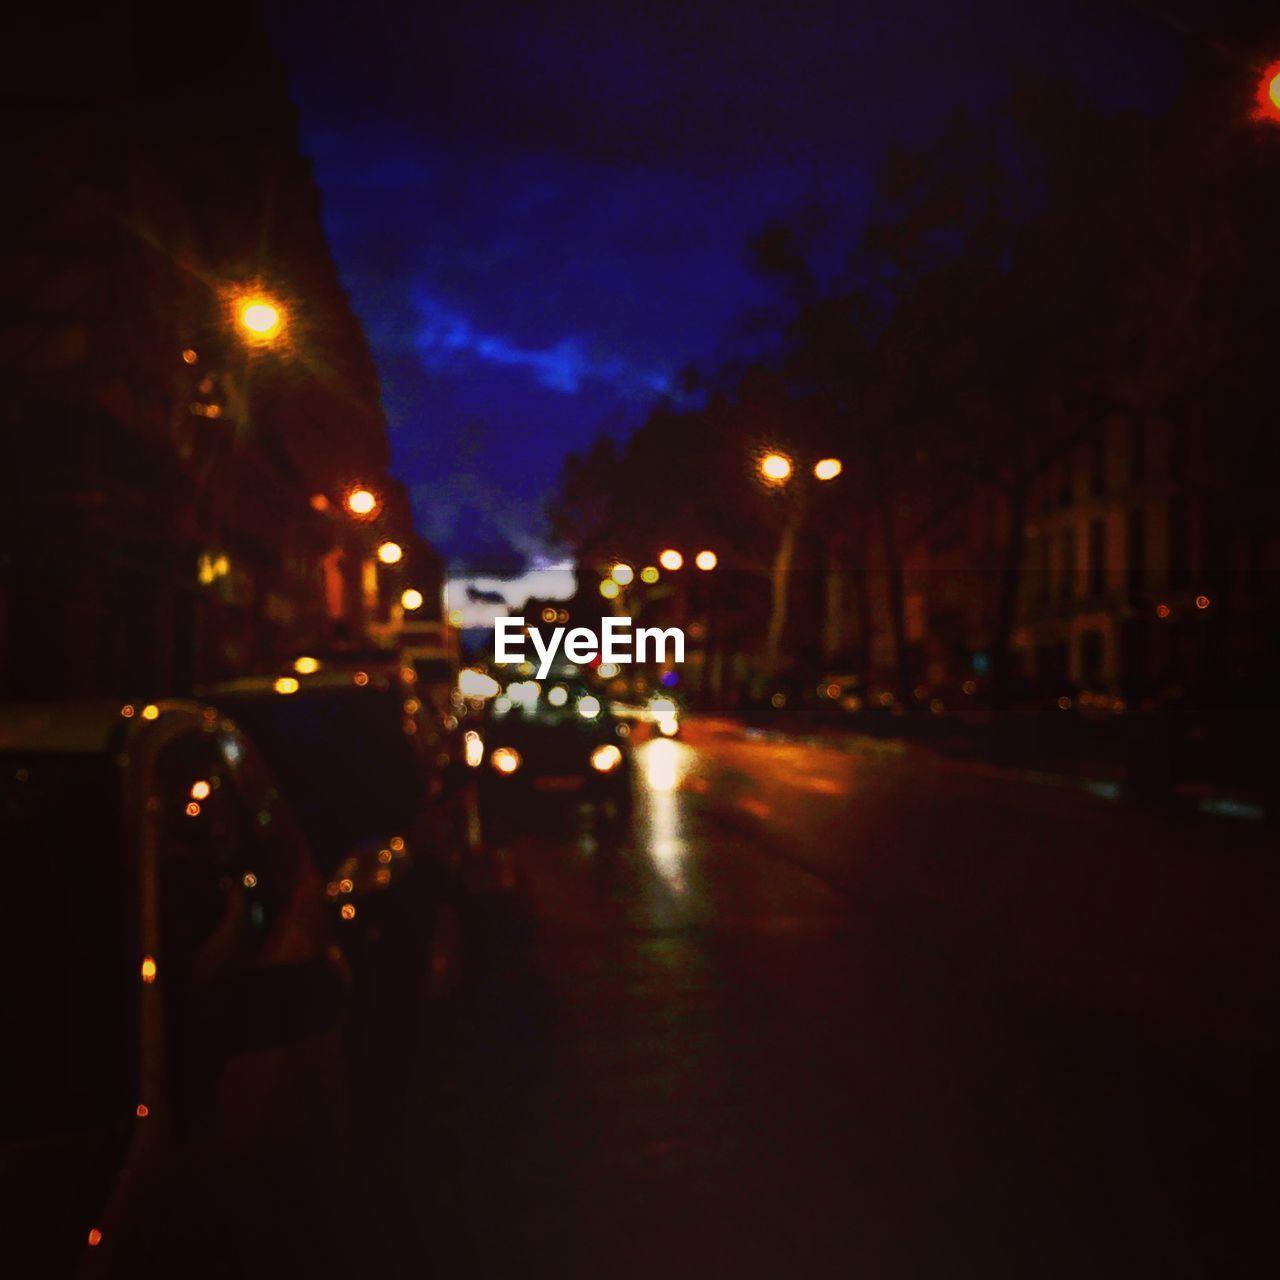 night, illuminated, street, car, city, outdoors, sky, no people, architecture